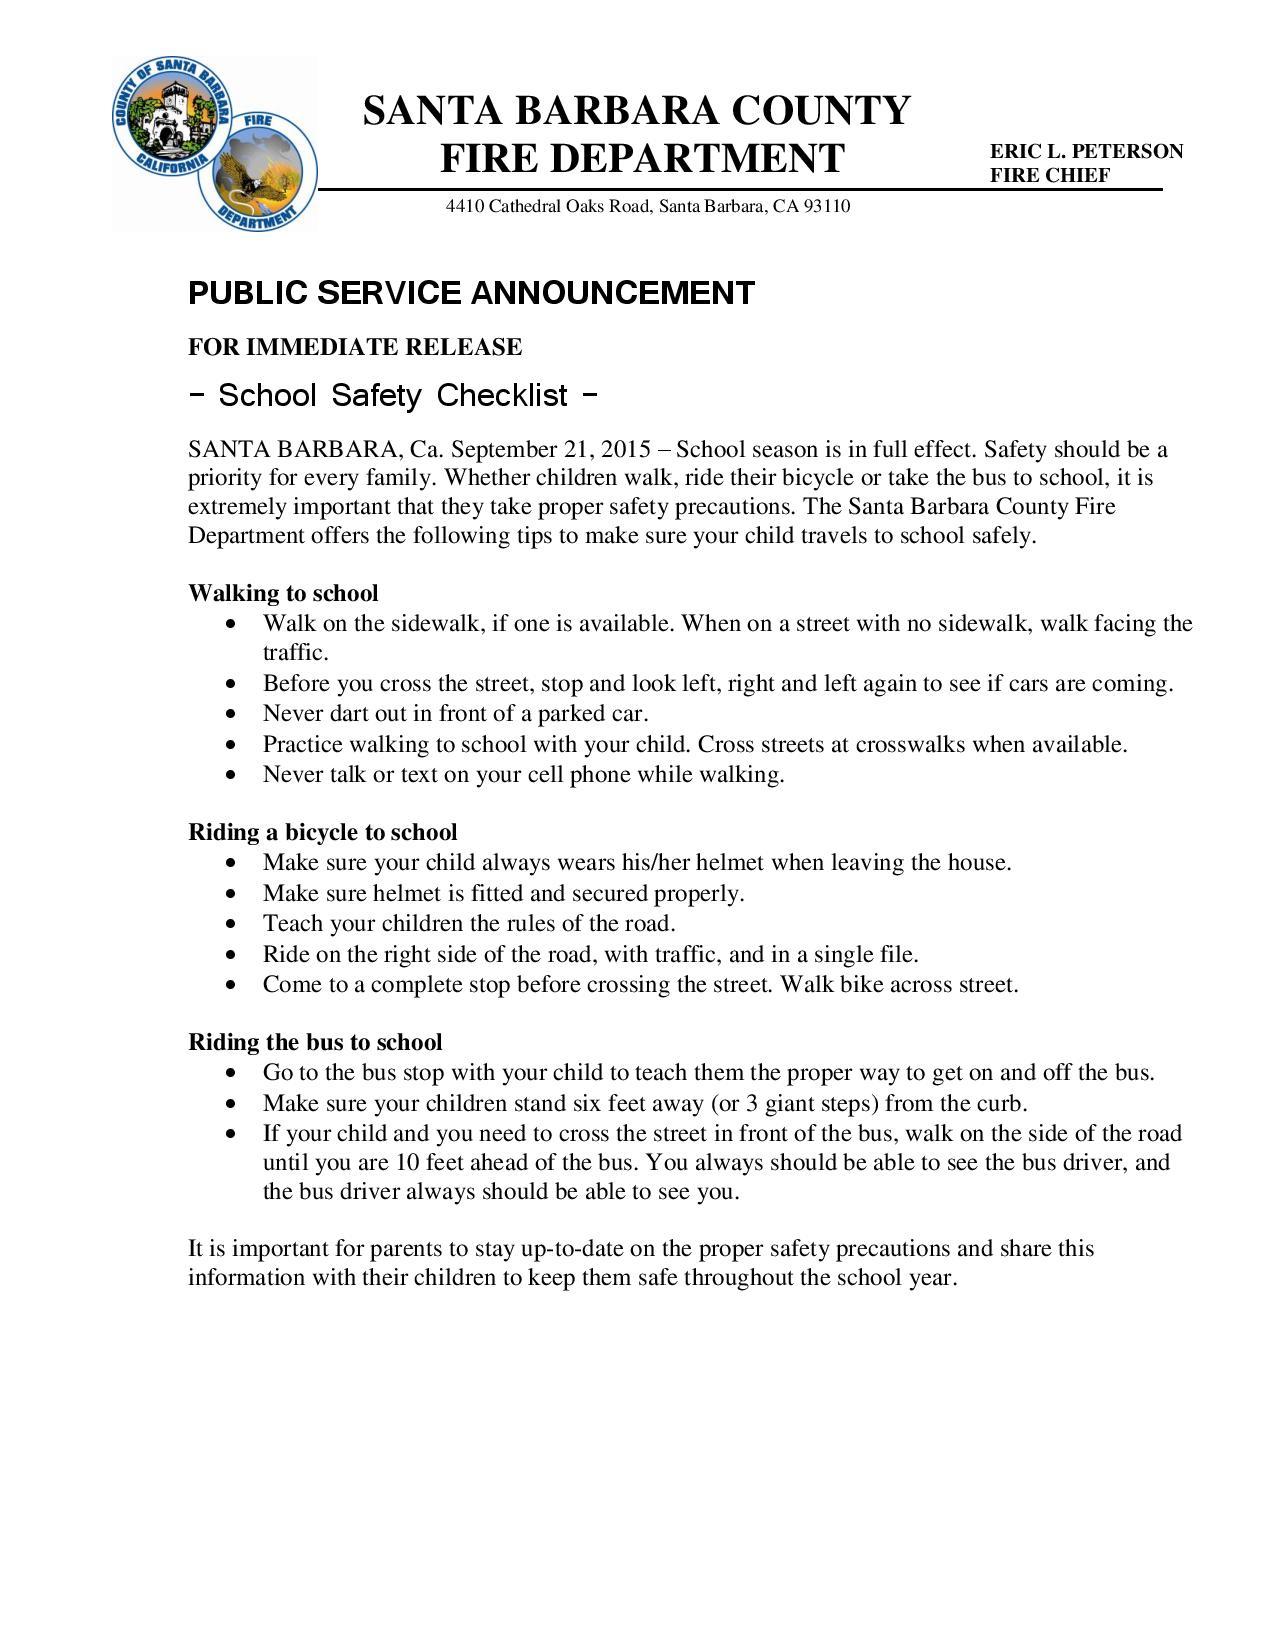 School Safety Checklist-pg1